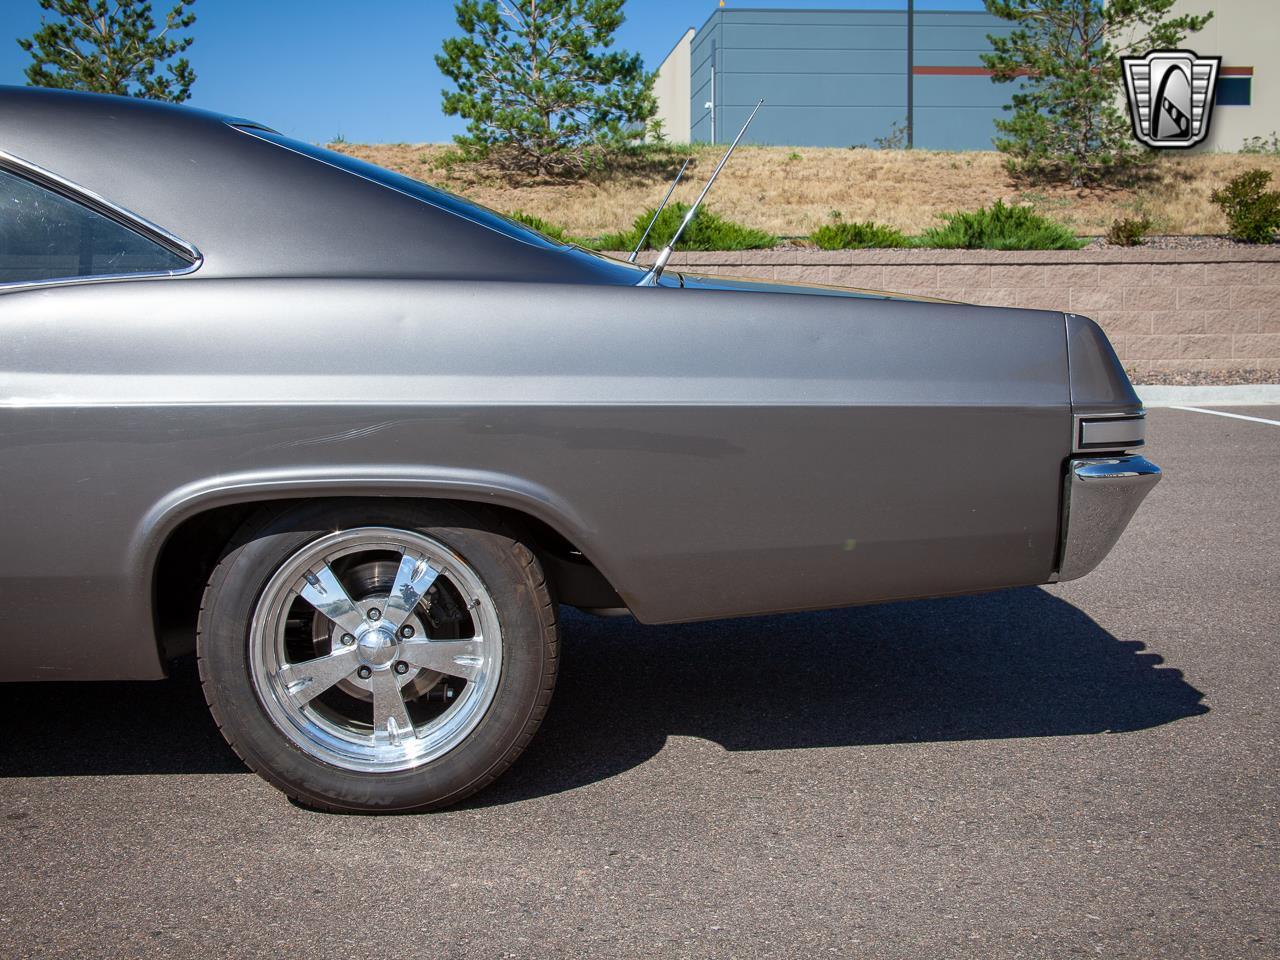 1965 Chevrolet Impala (CC-1375313) for sale in O'Fallon, Illinois